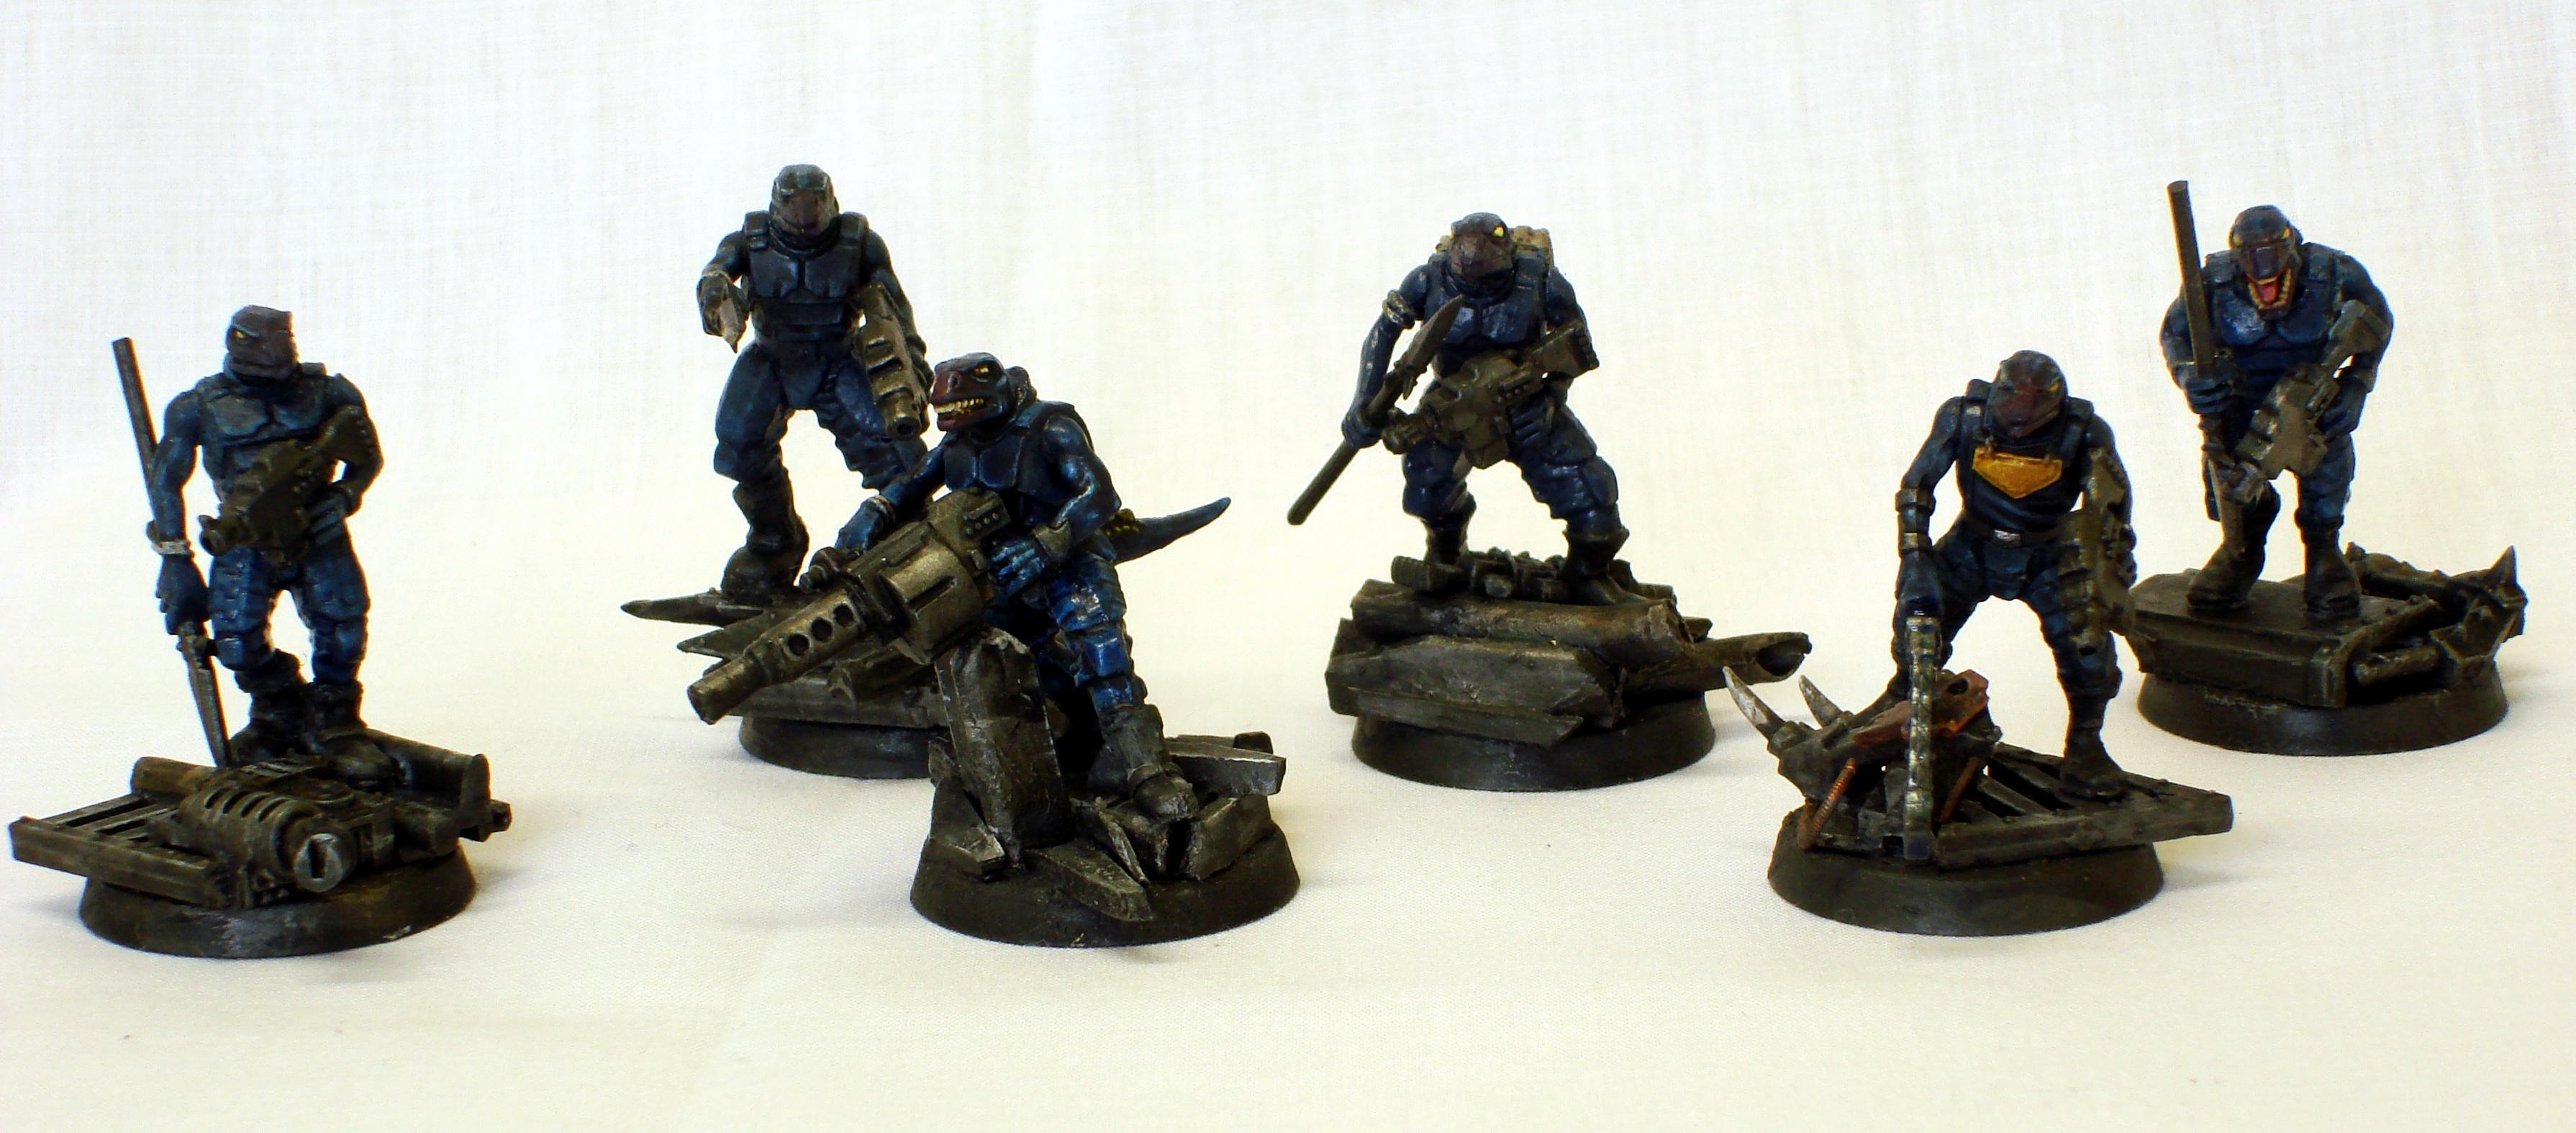 Mercenary, Tarellian Dog Soldier, Xenos